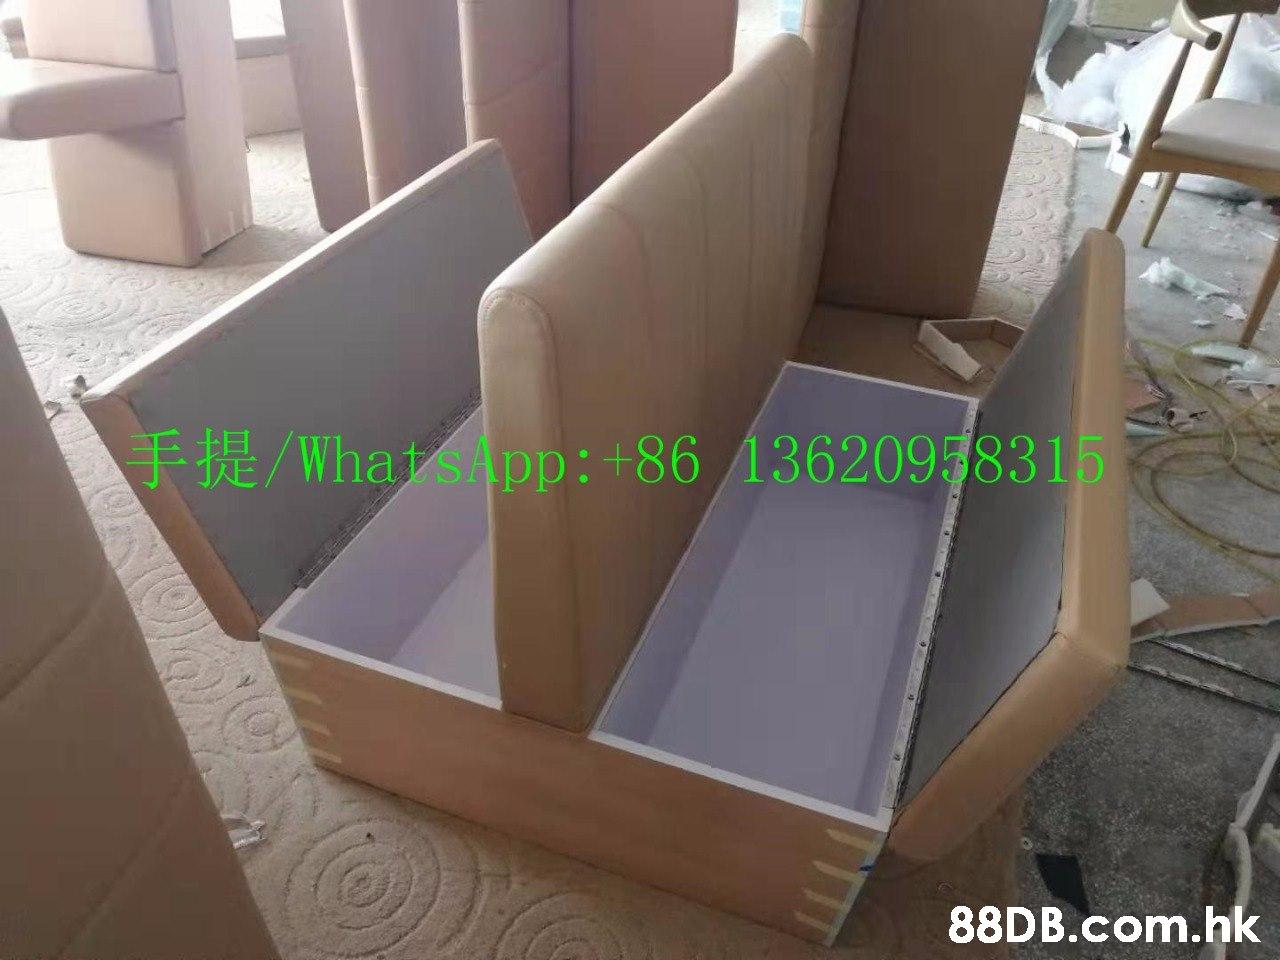 FWhatsApp: +86/13620958315 .hk  Product,Wood,Plywood,Cardboard,Furniture